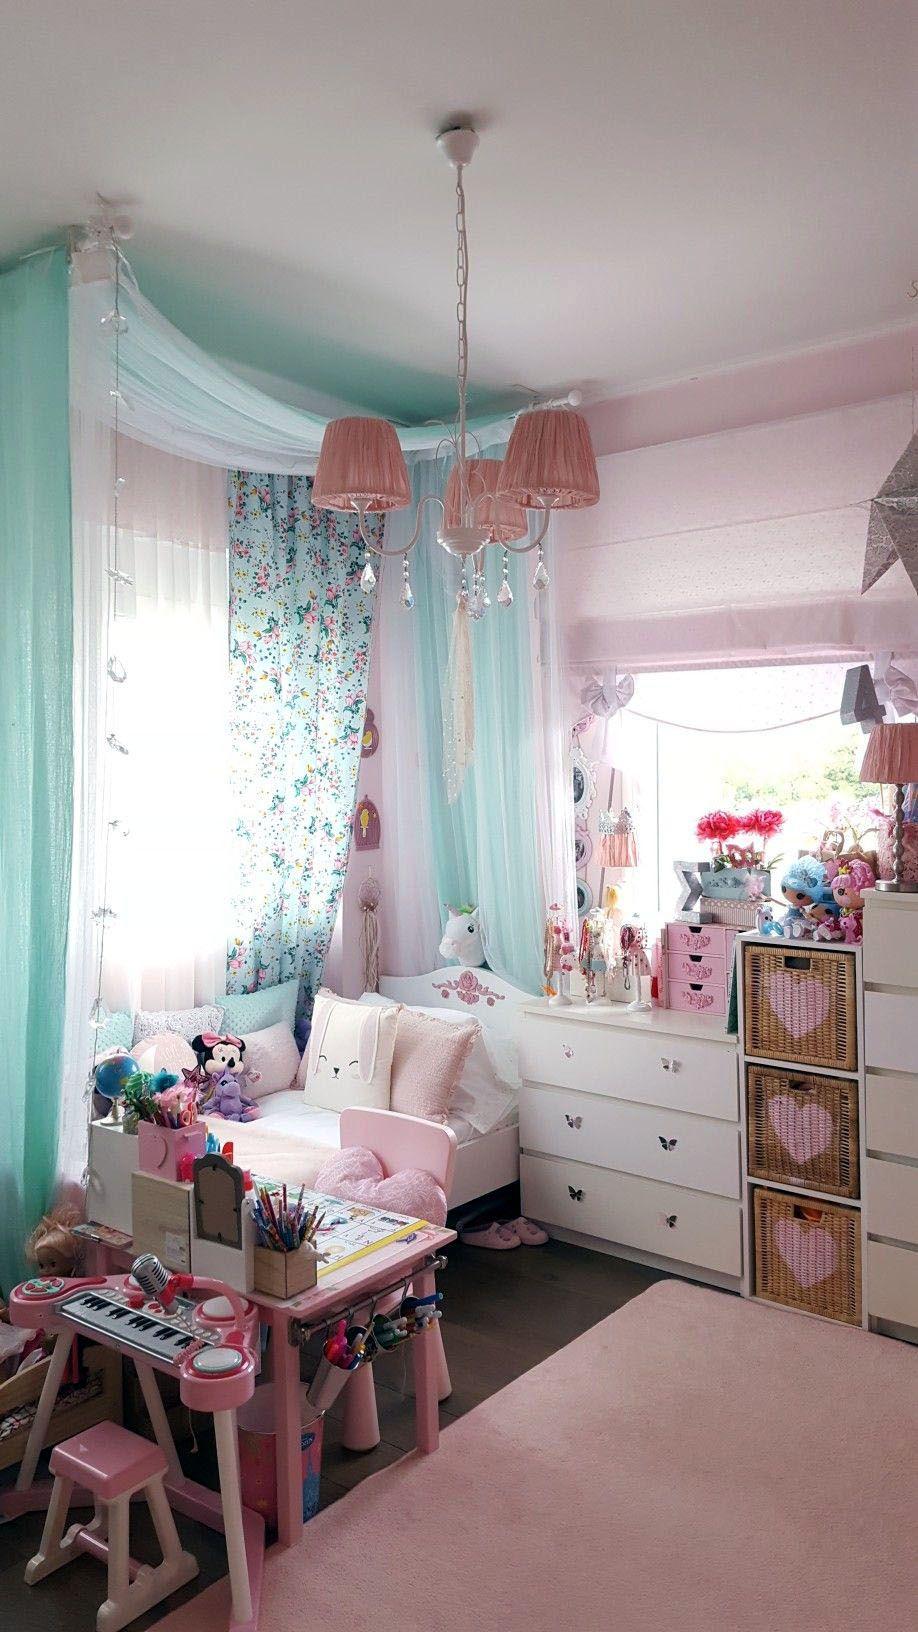 How To Create Shabby Chic Bedroom Shabby Chic Girls Bedroom